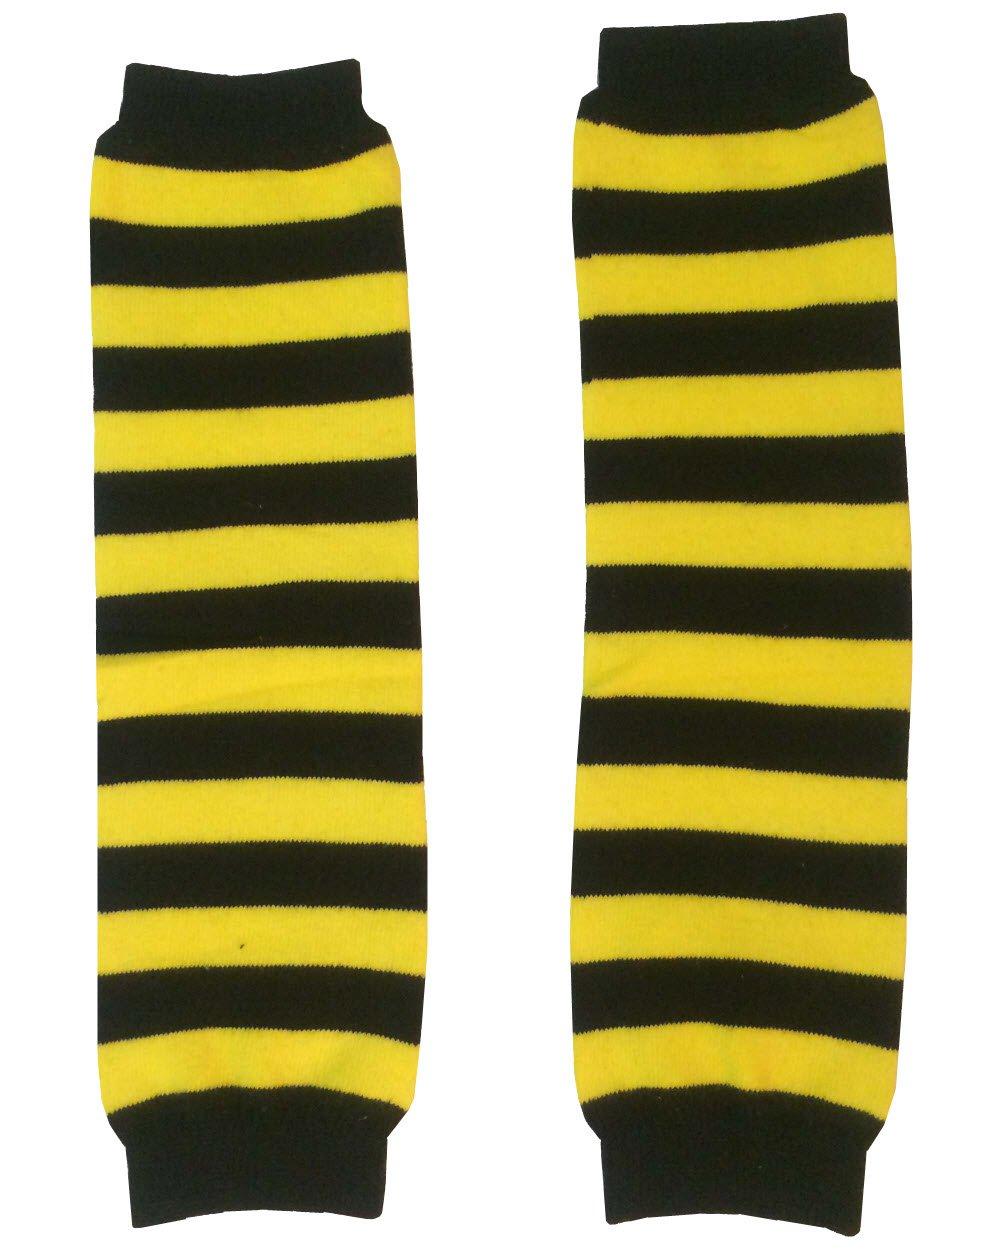 KWC - Yellow & Black Stripes Baby Leg Warmer/Leggings (Bee) Kam Wing Cheong